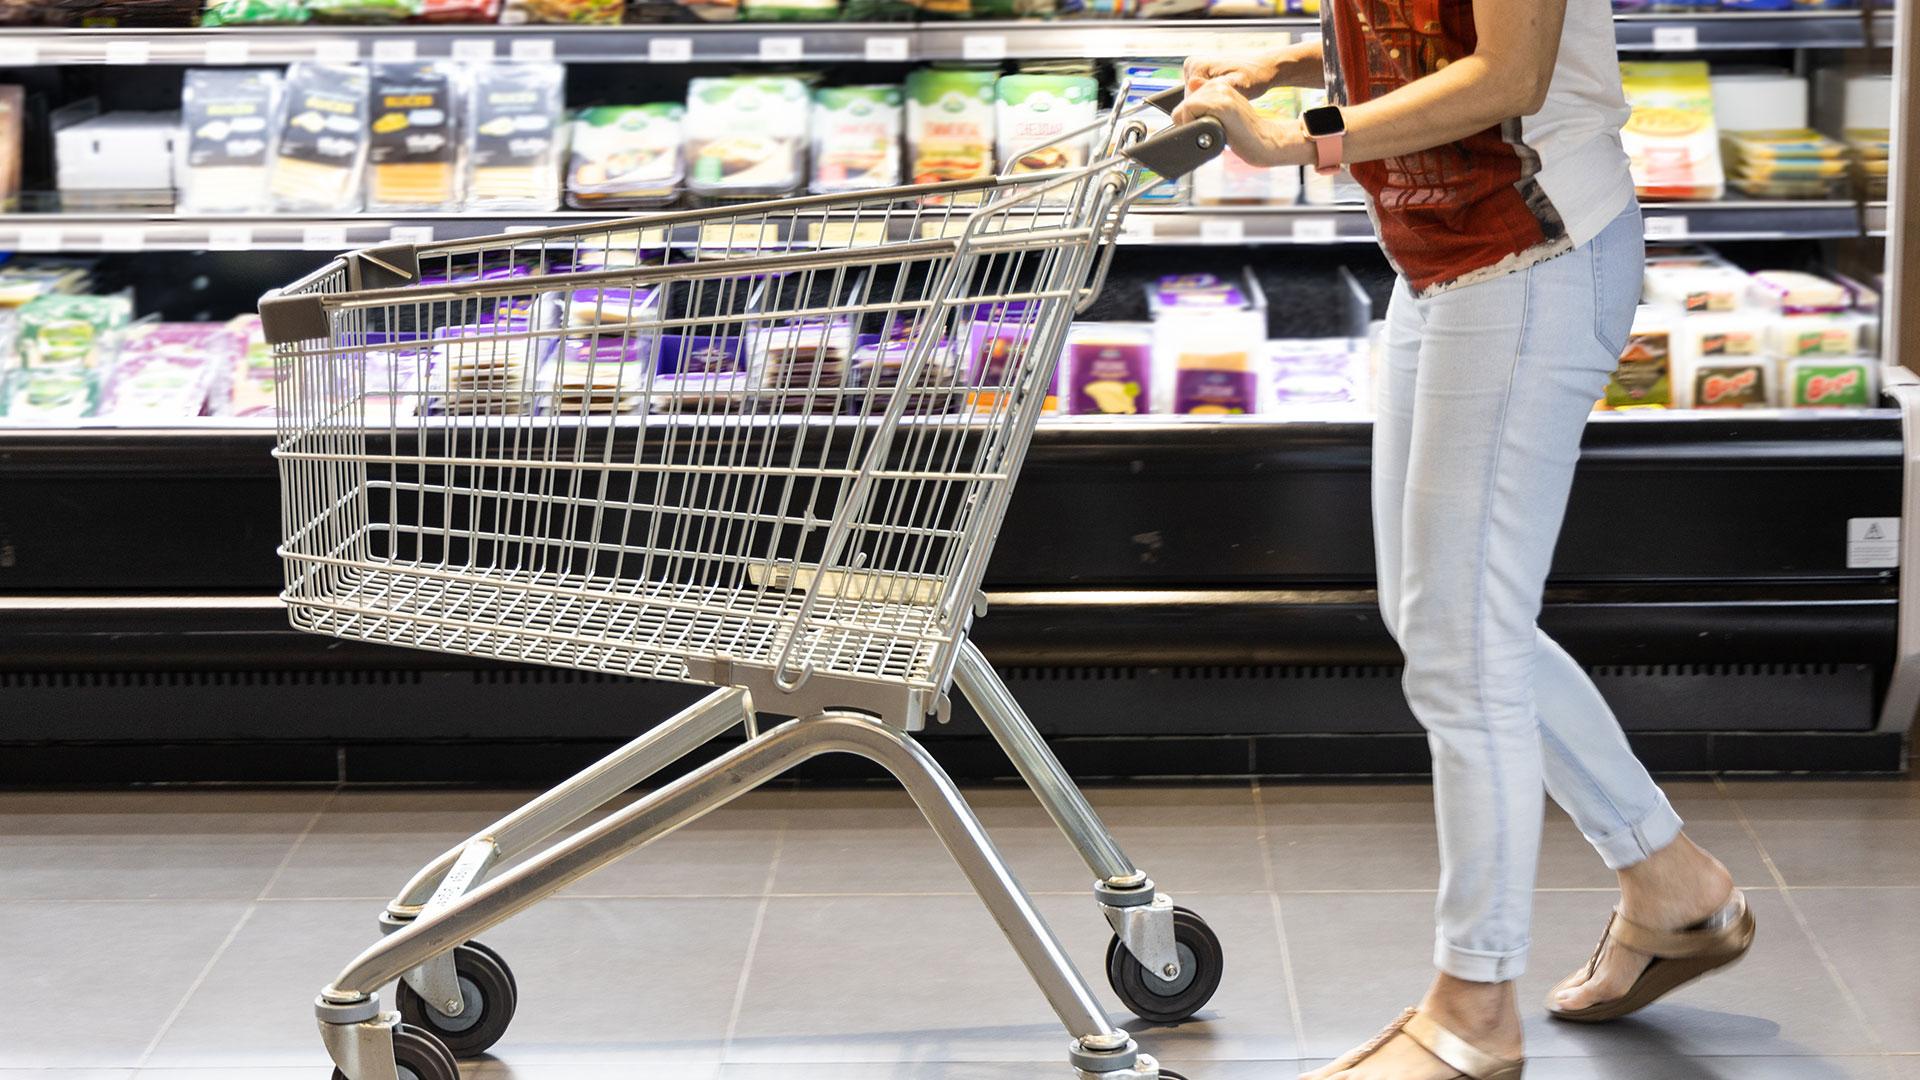 commercial cleaning kelowna penticton vernon kamloops grocery store